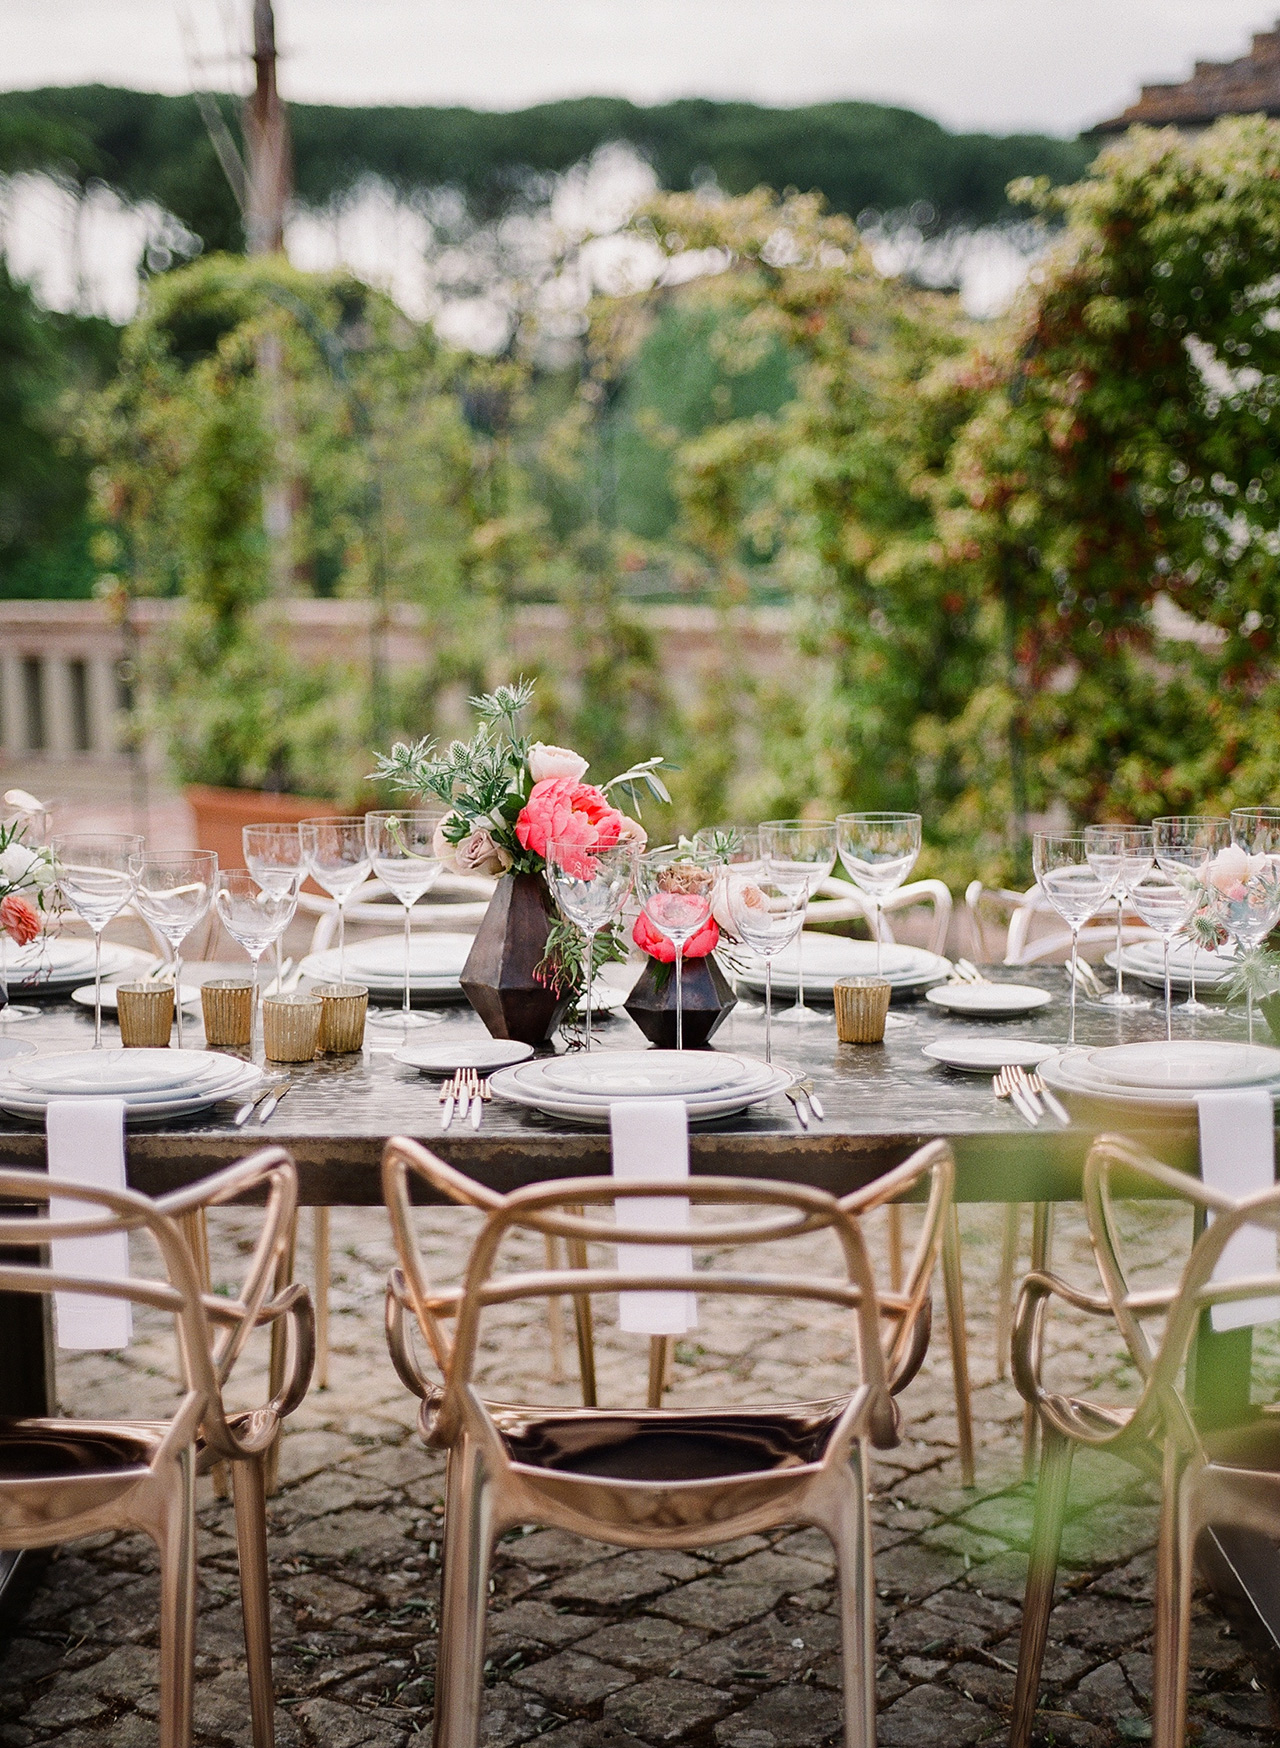 gold utensils white place settings dinnerware outdoors